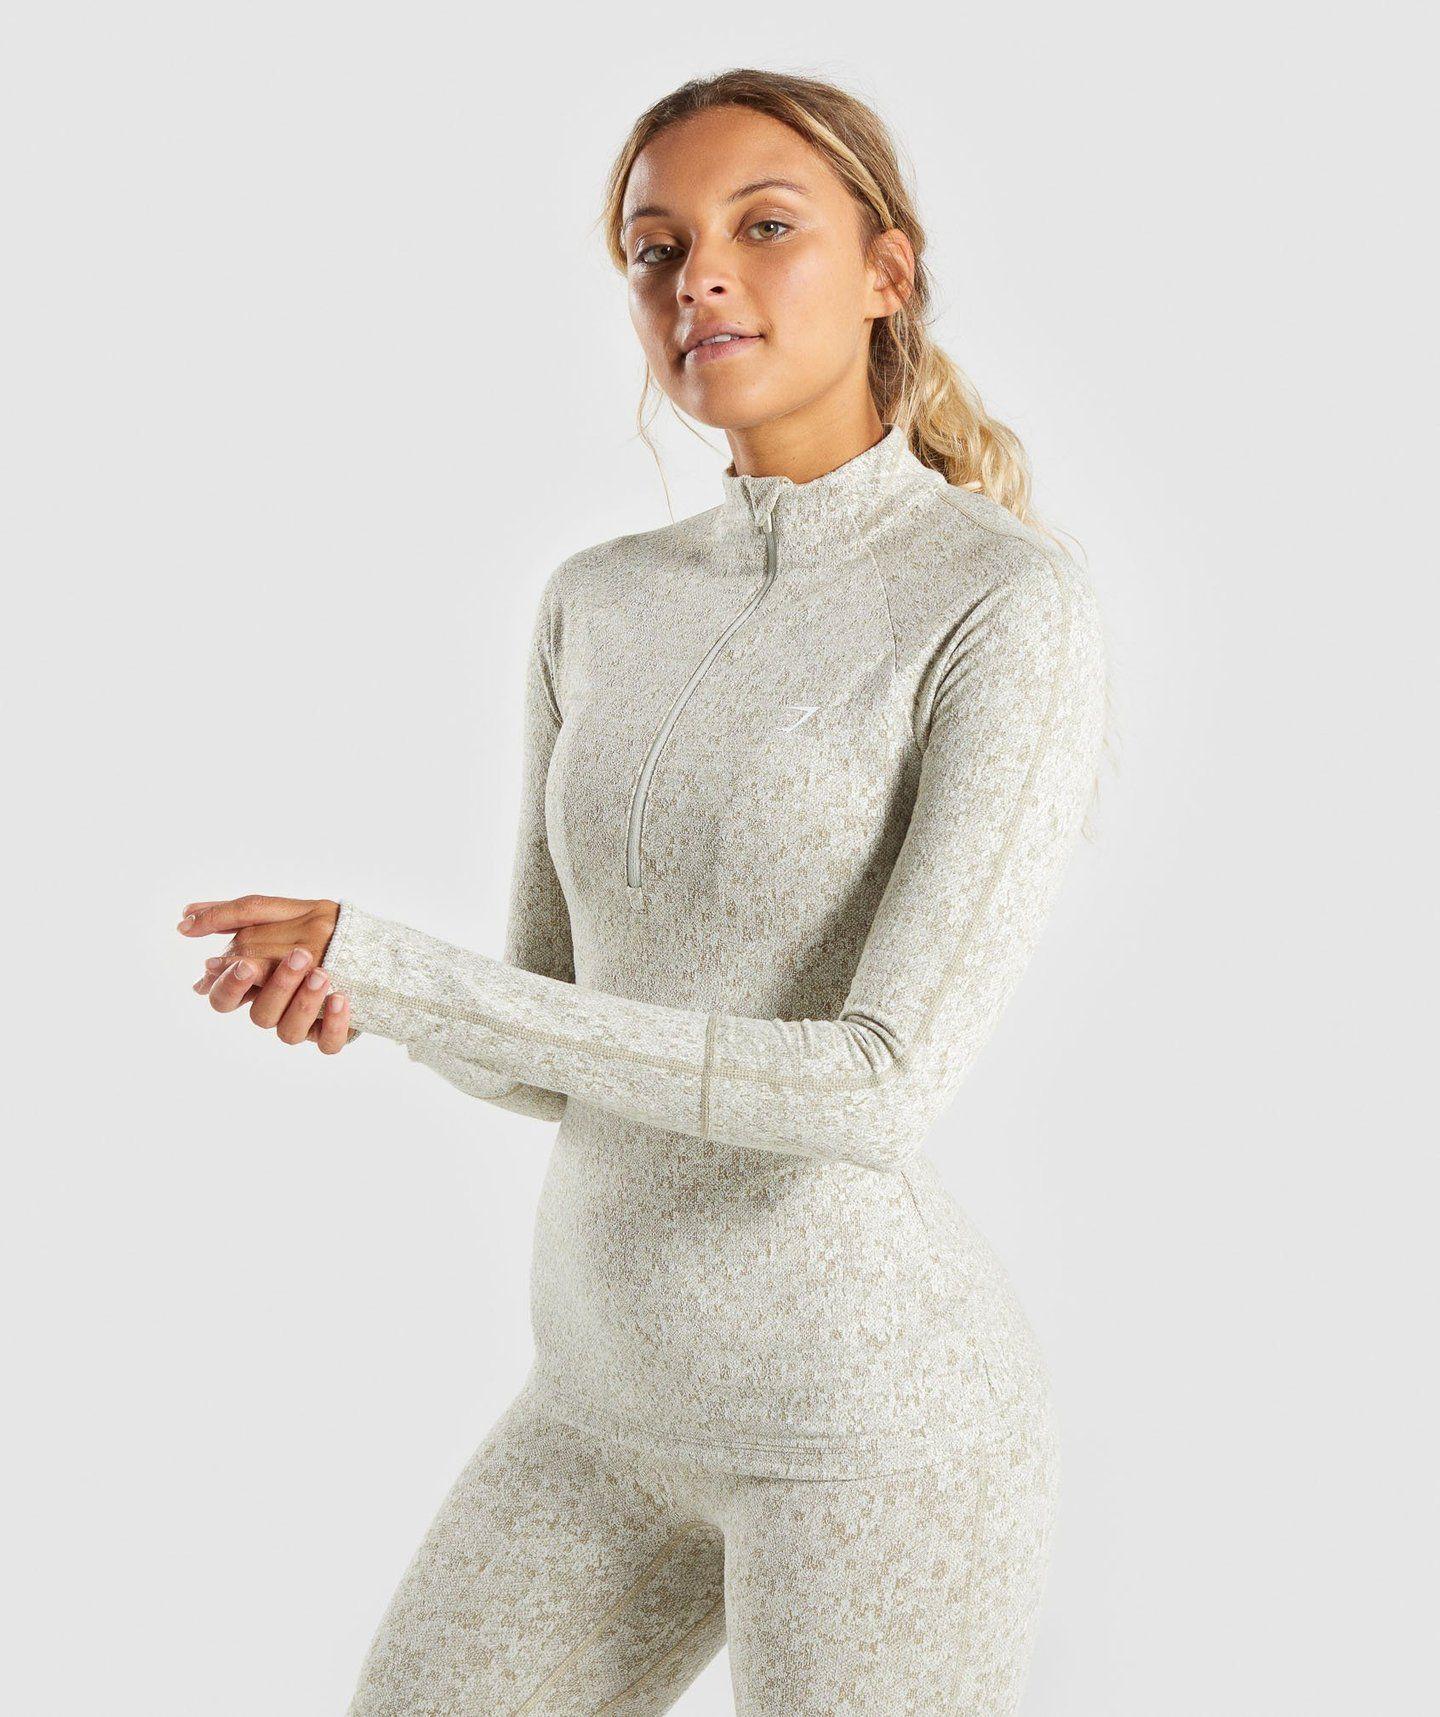 9c0ceafb36 Gymshark Fleur Texture 1 2 Zip Pullover - Washed Khaki Marl ...